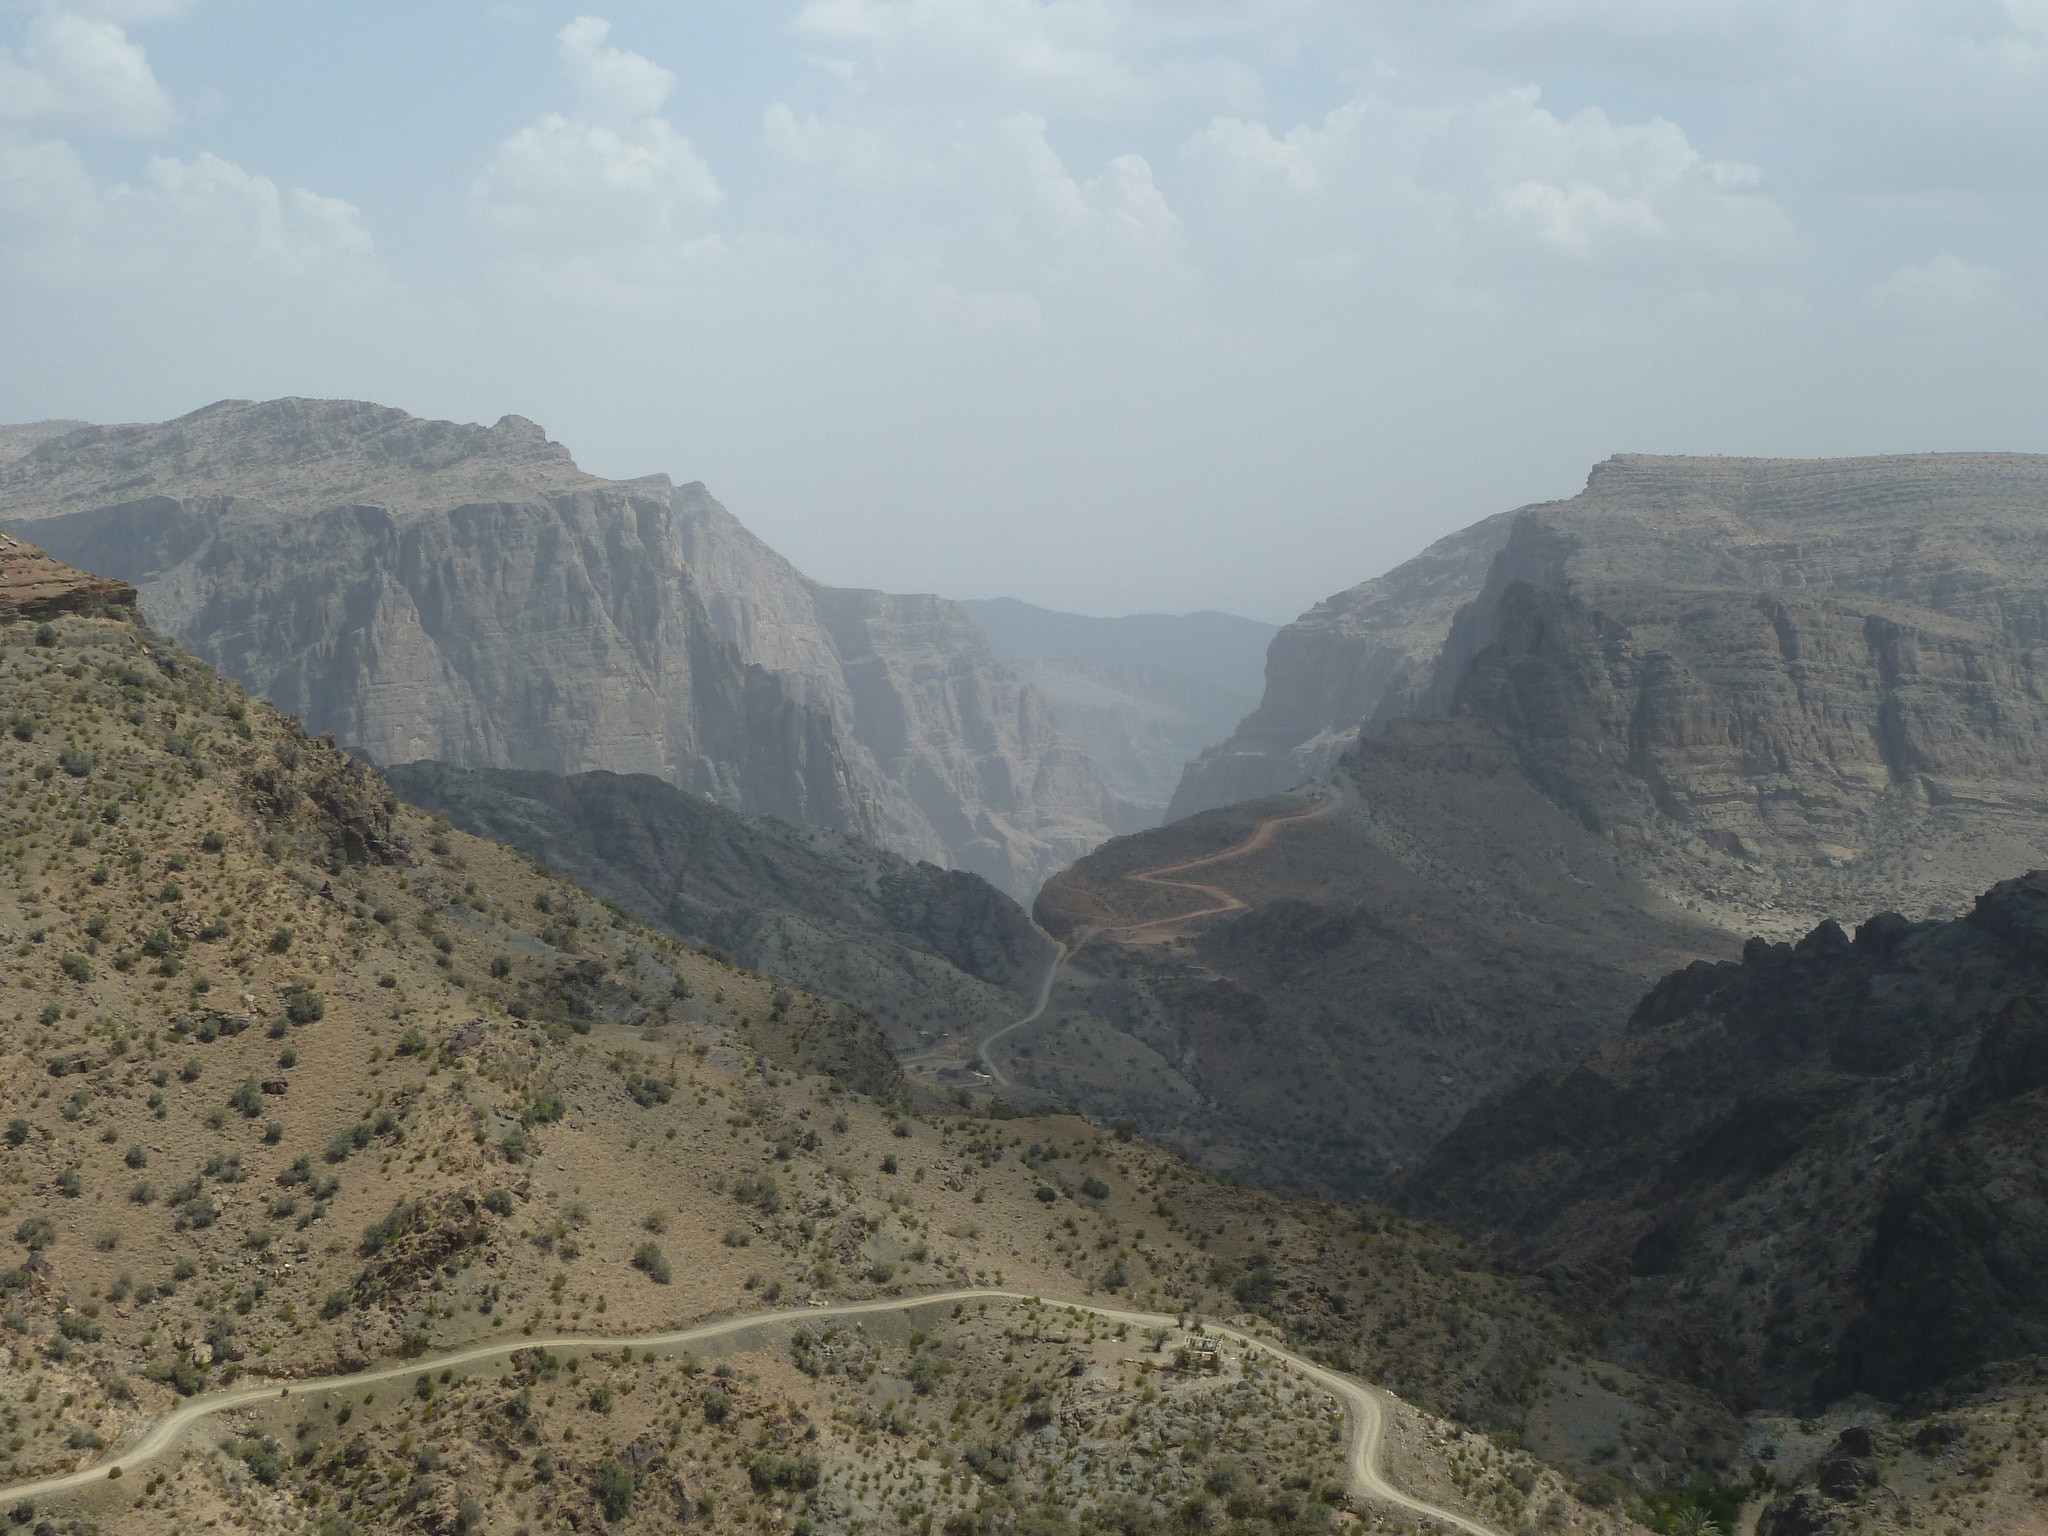 Hajar Mountains | © Kathryn james/Flickr